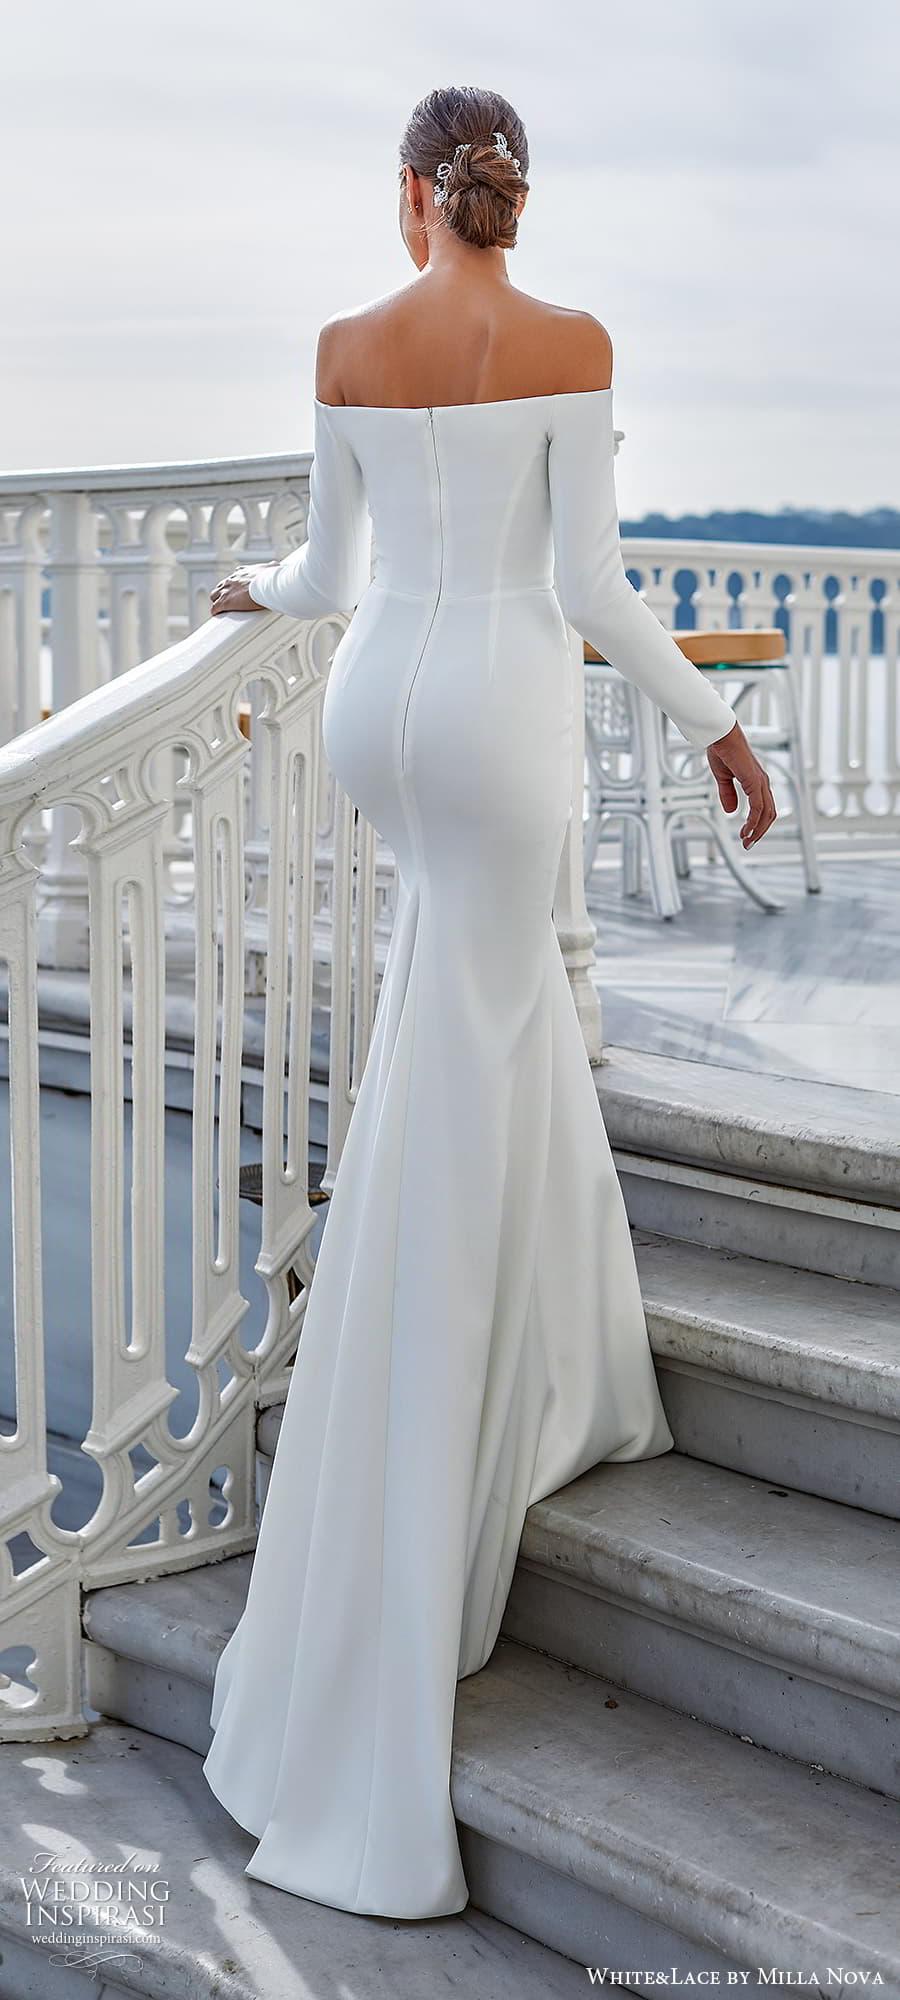 white lace milla nova 2022 bridal long sleeve off shoulder straight across neckline clean minimalist sheath wedding dress slit skirt (28) bv